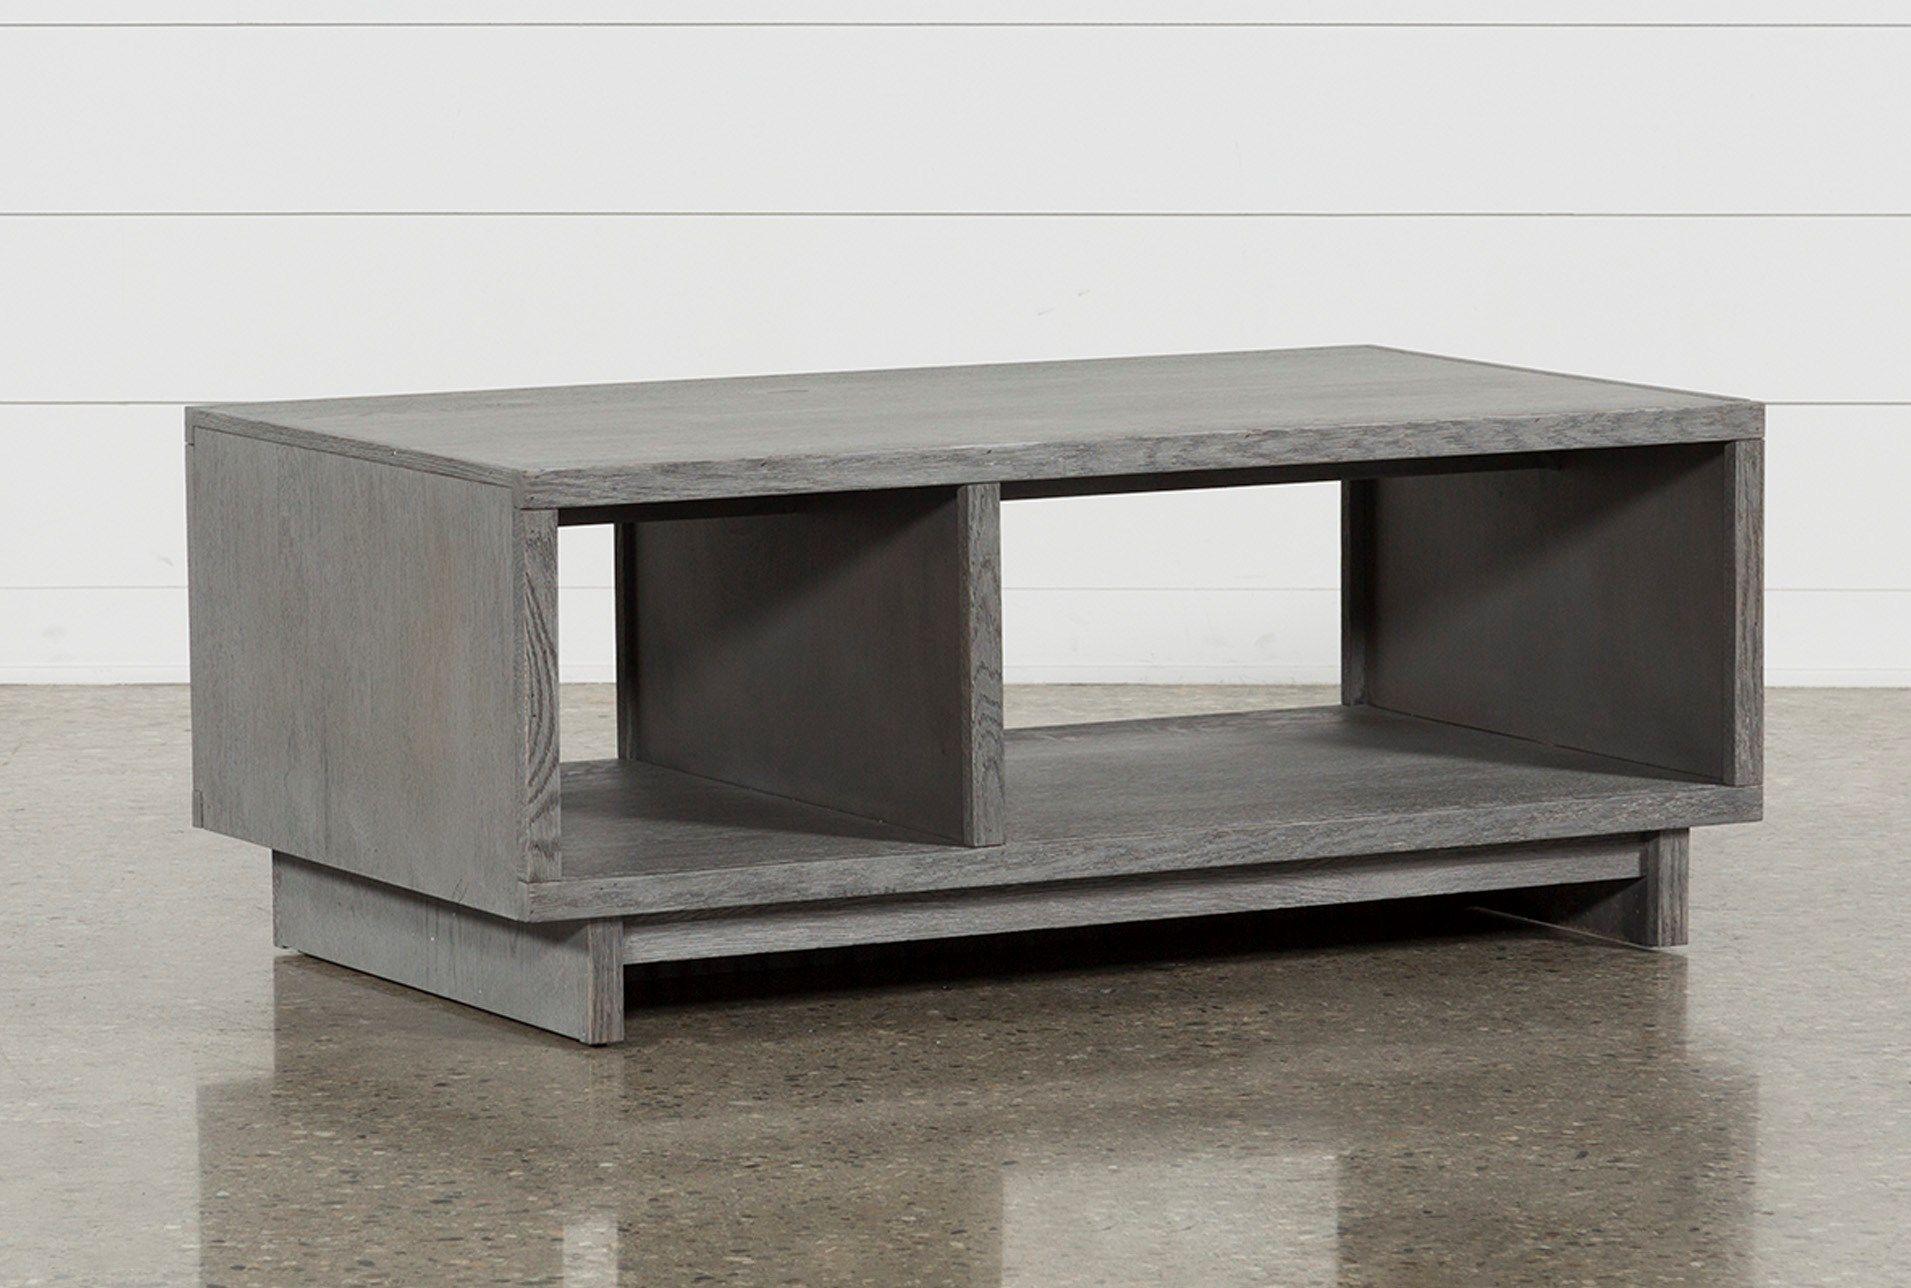 48 X 25 5 Coffee Table Coffee Table Living Spaces Living Room Furnishings [ 1288 x 1911 Pixel ]